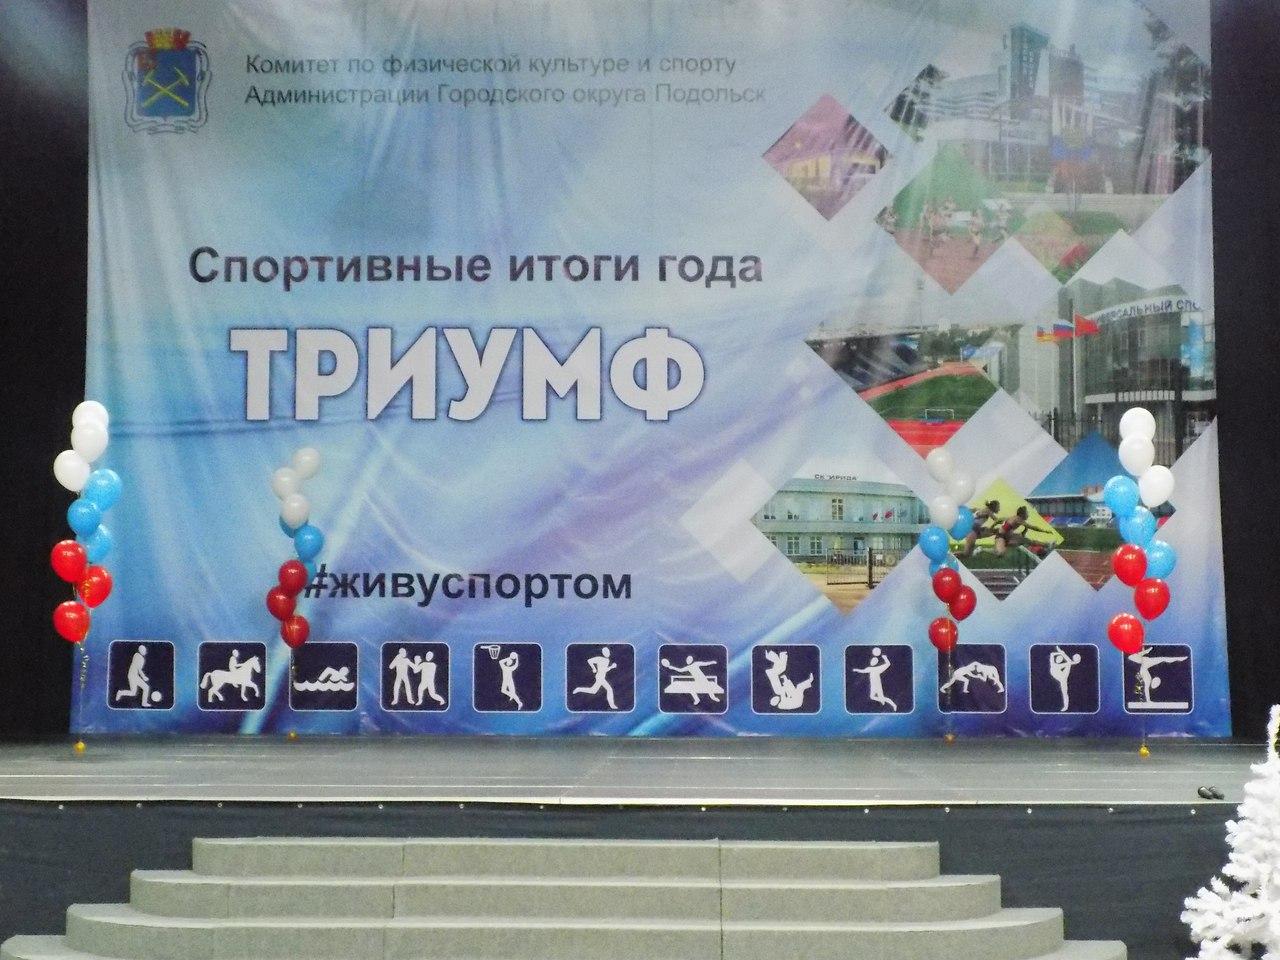 Футбольную школу «Витязь» наградили на премии «Триумф»